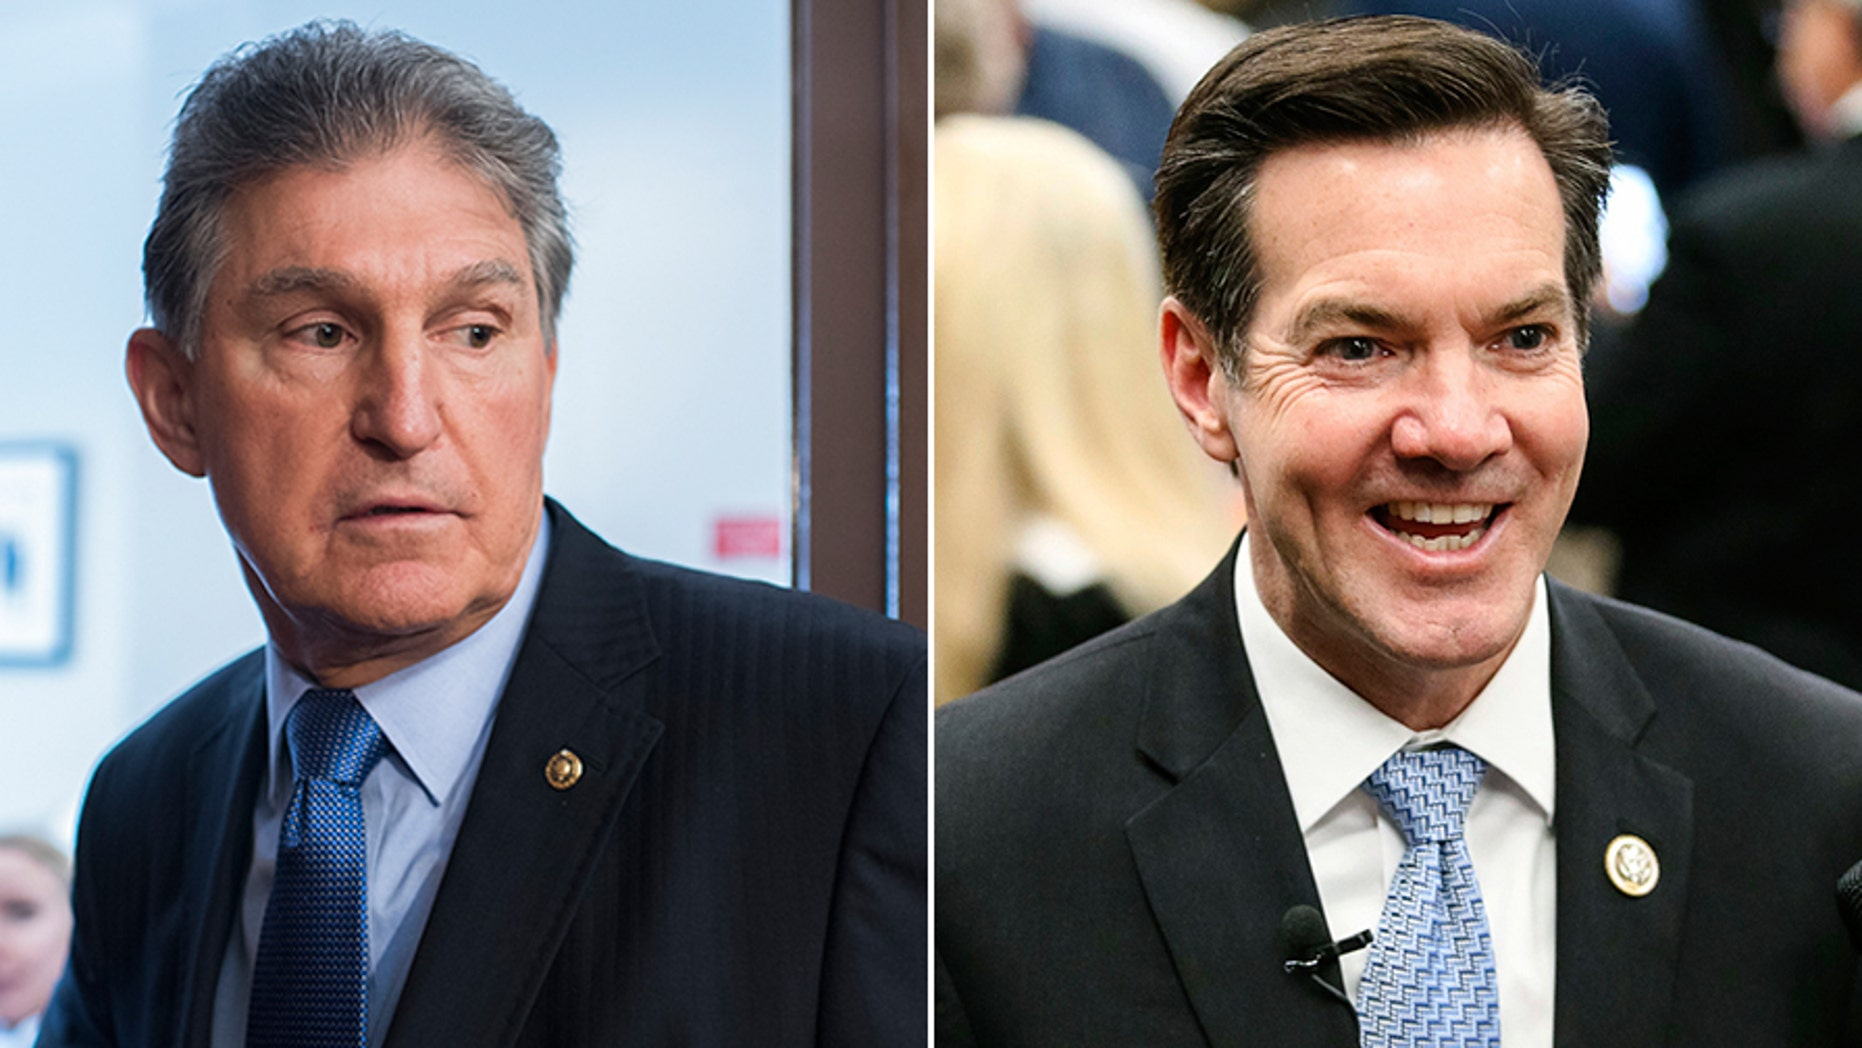 Sen. Joe Manchin (left) and Rep. Evan Jenkins, both of West Virginia